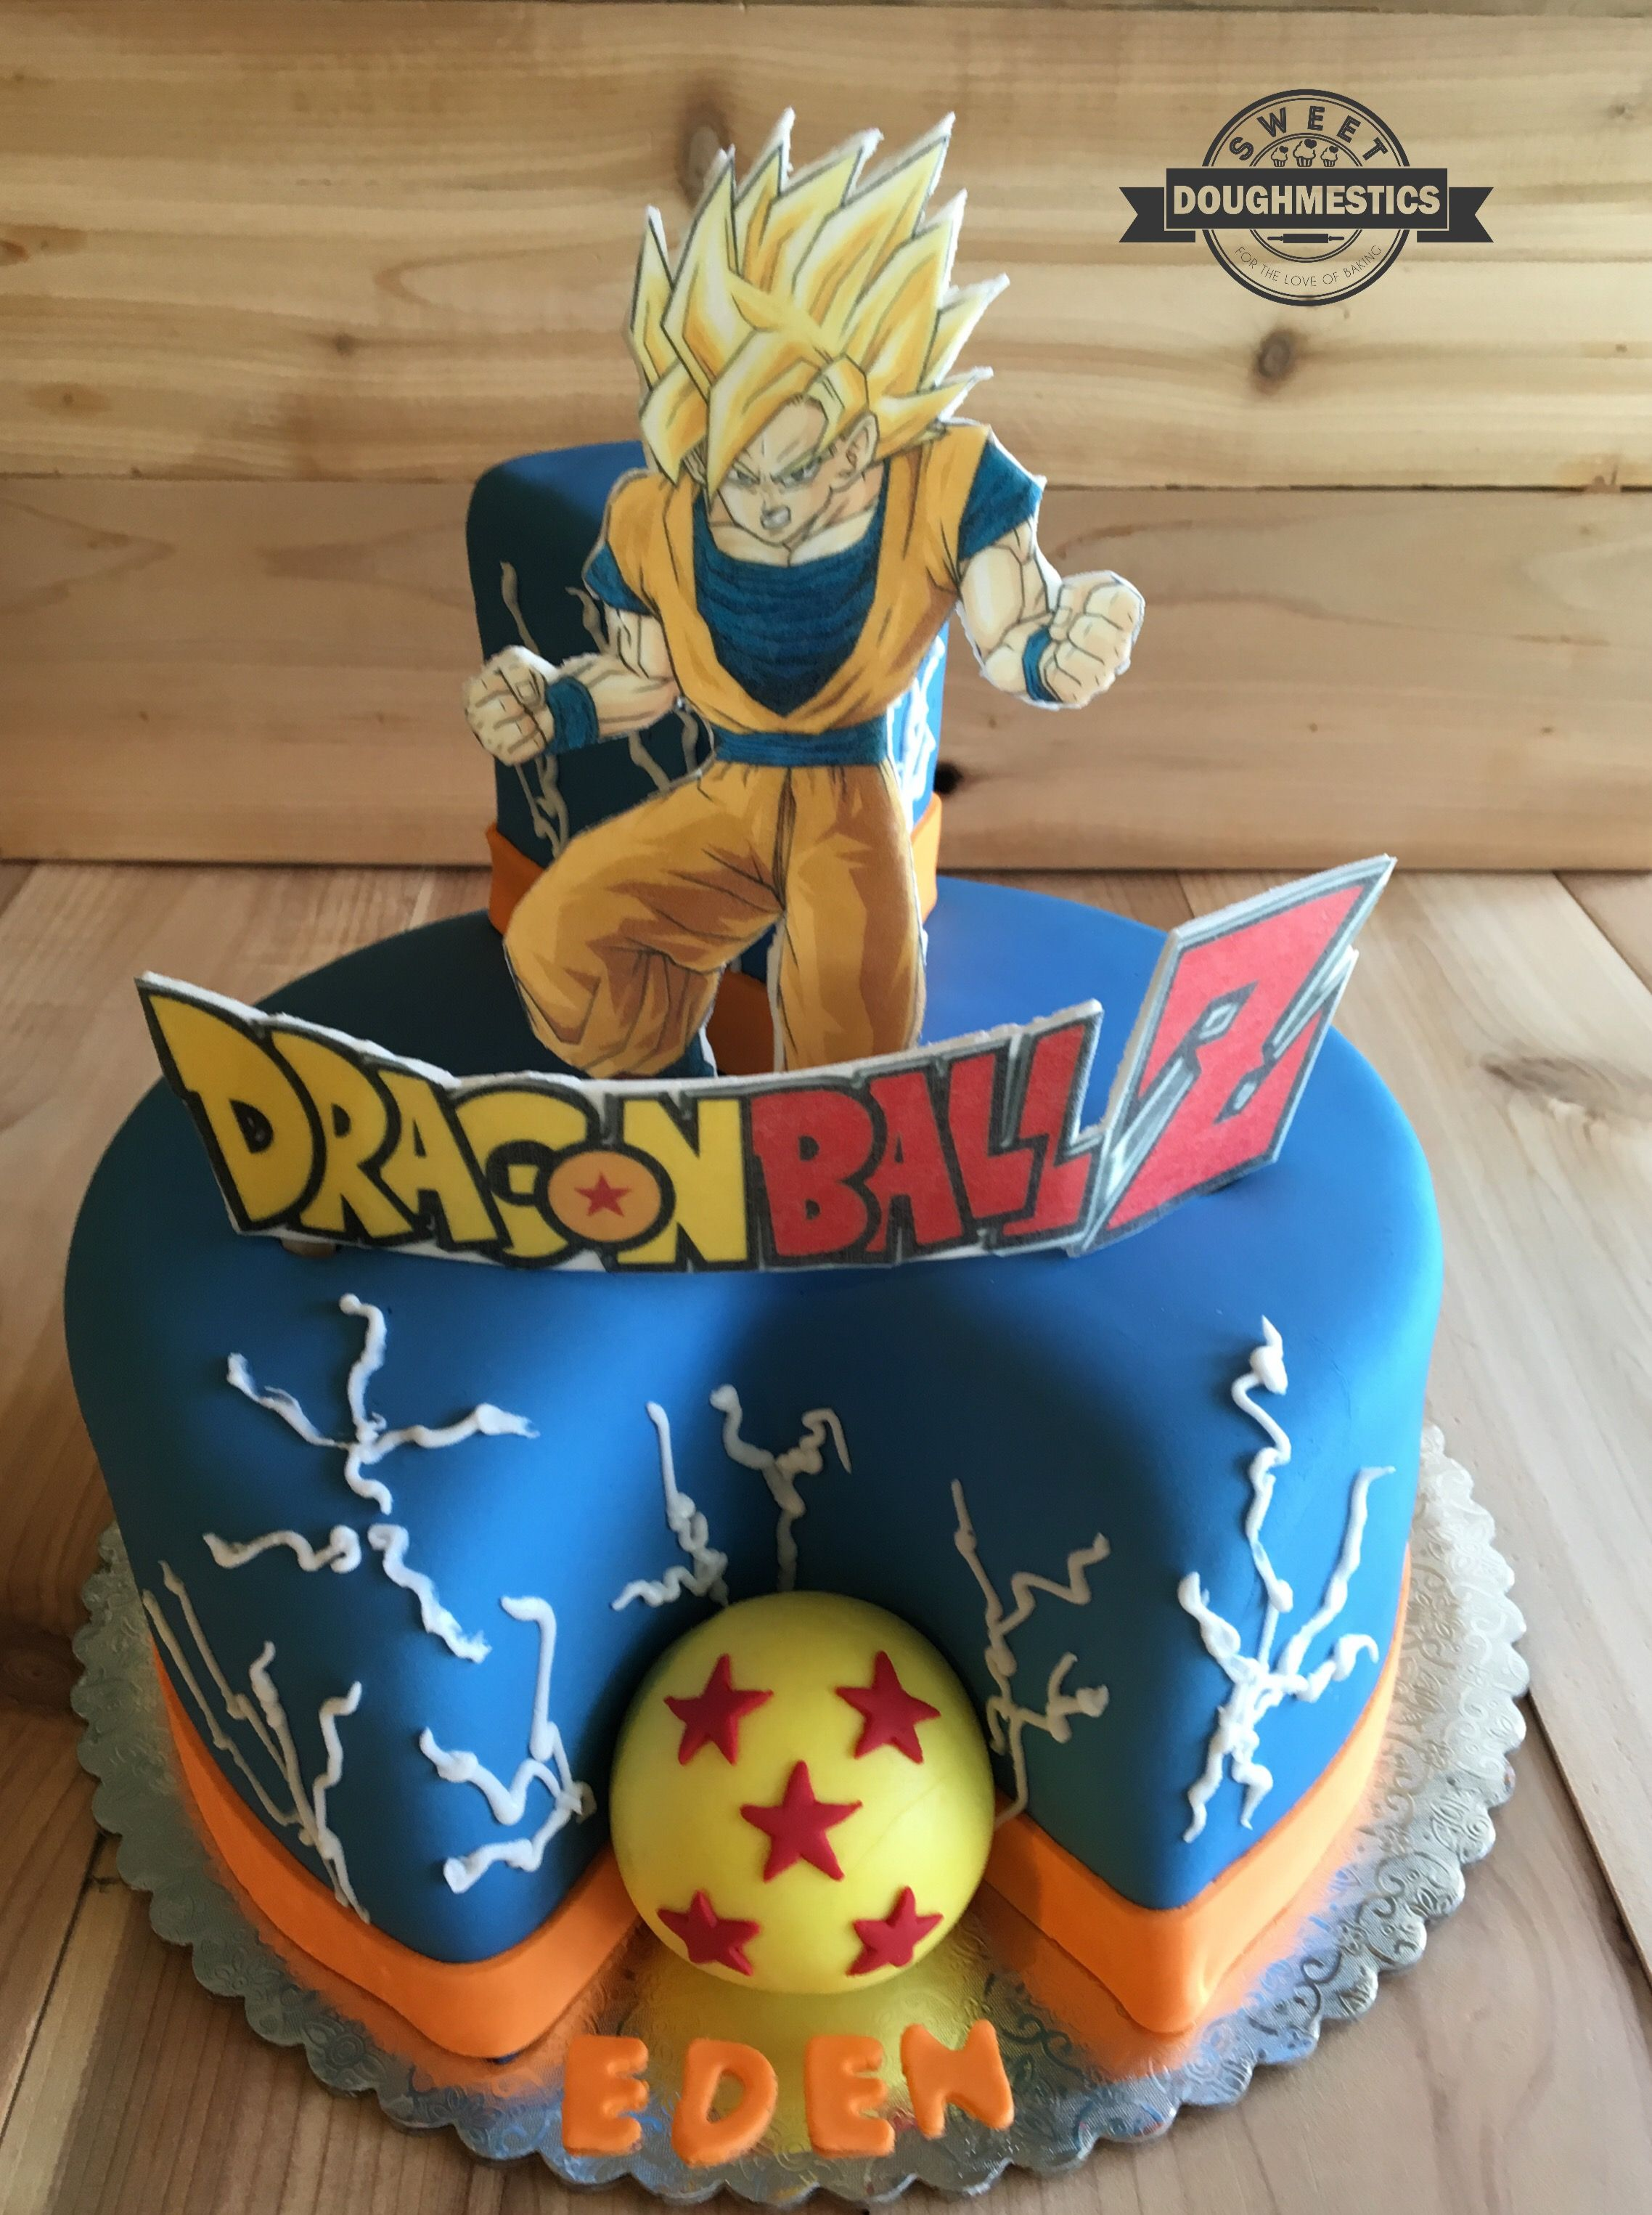 Dragon Ball Z Cake By Sweet Doughmestics With Images Goku